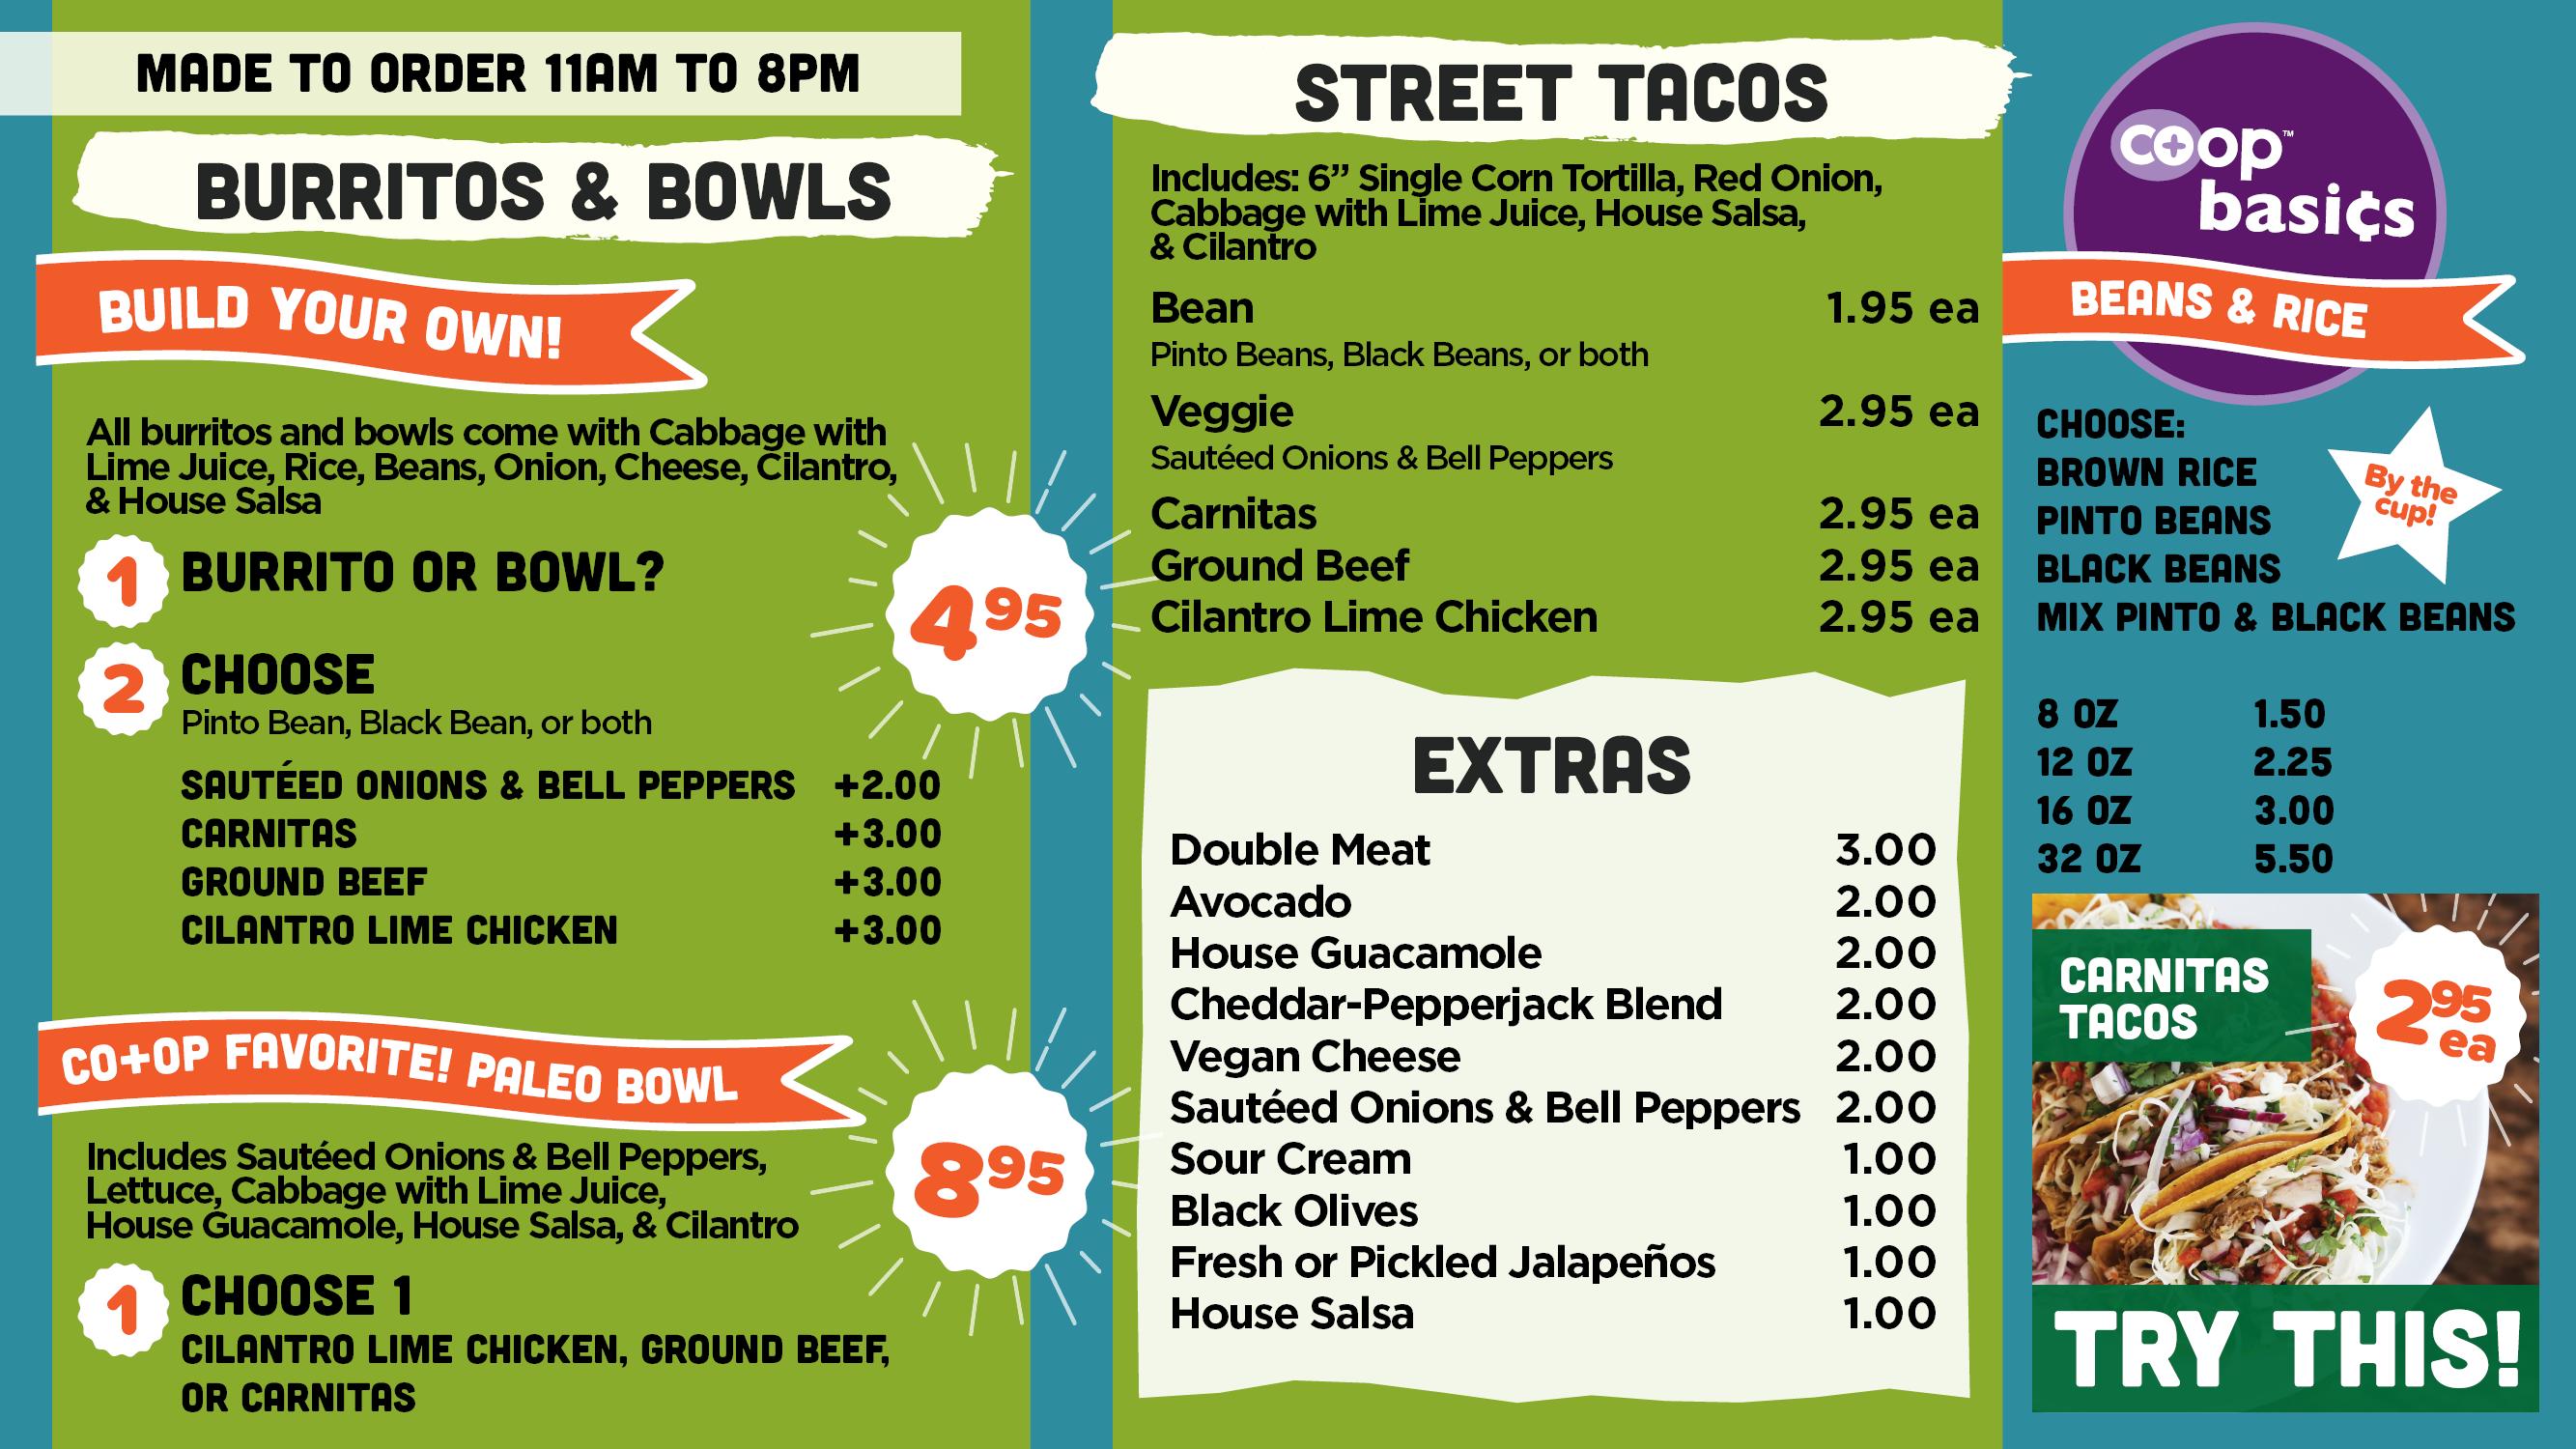 Co-op Kitchen Burrito & Taco menu